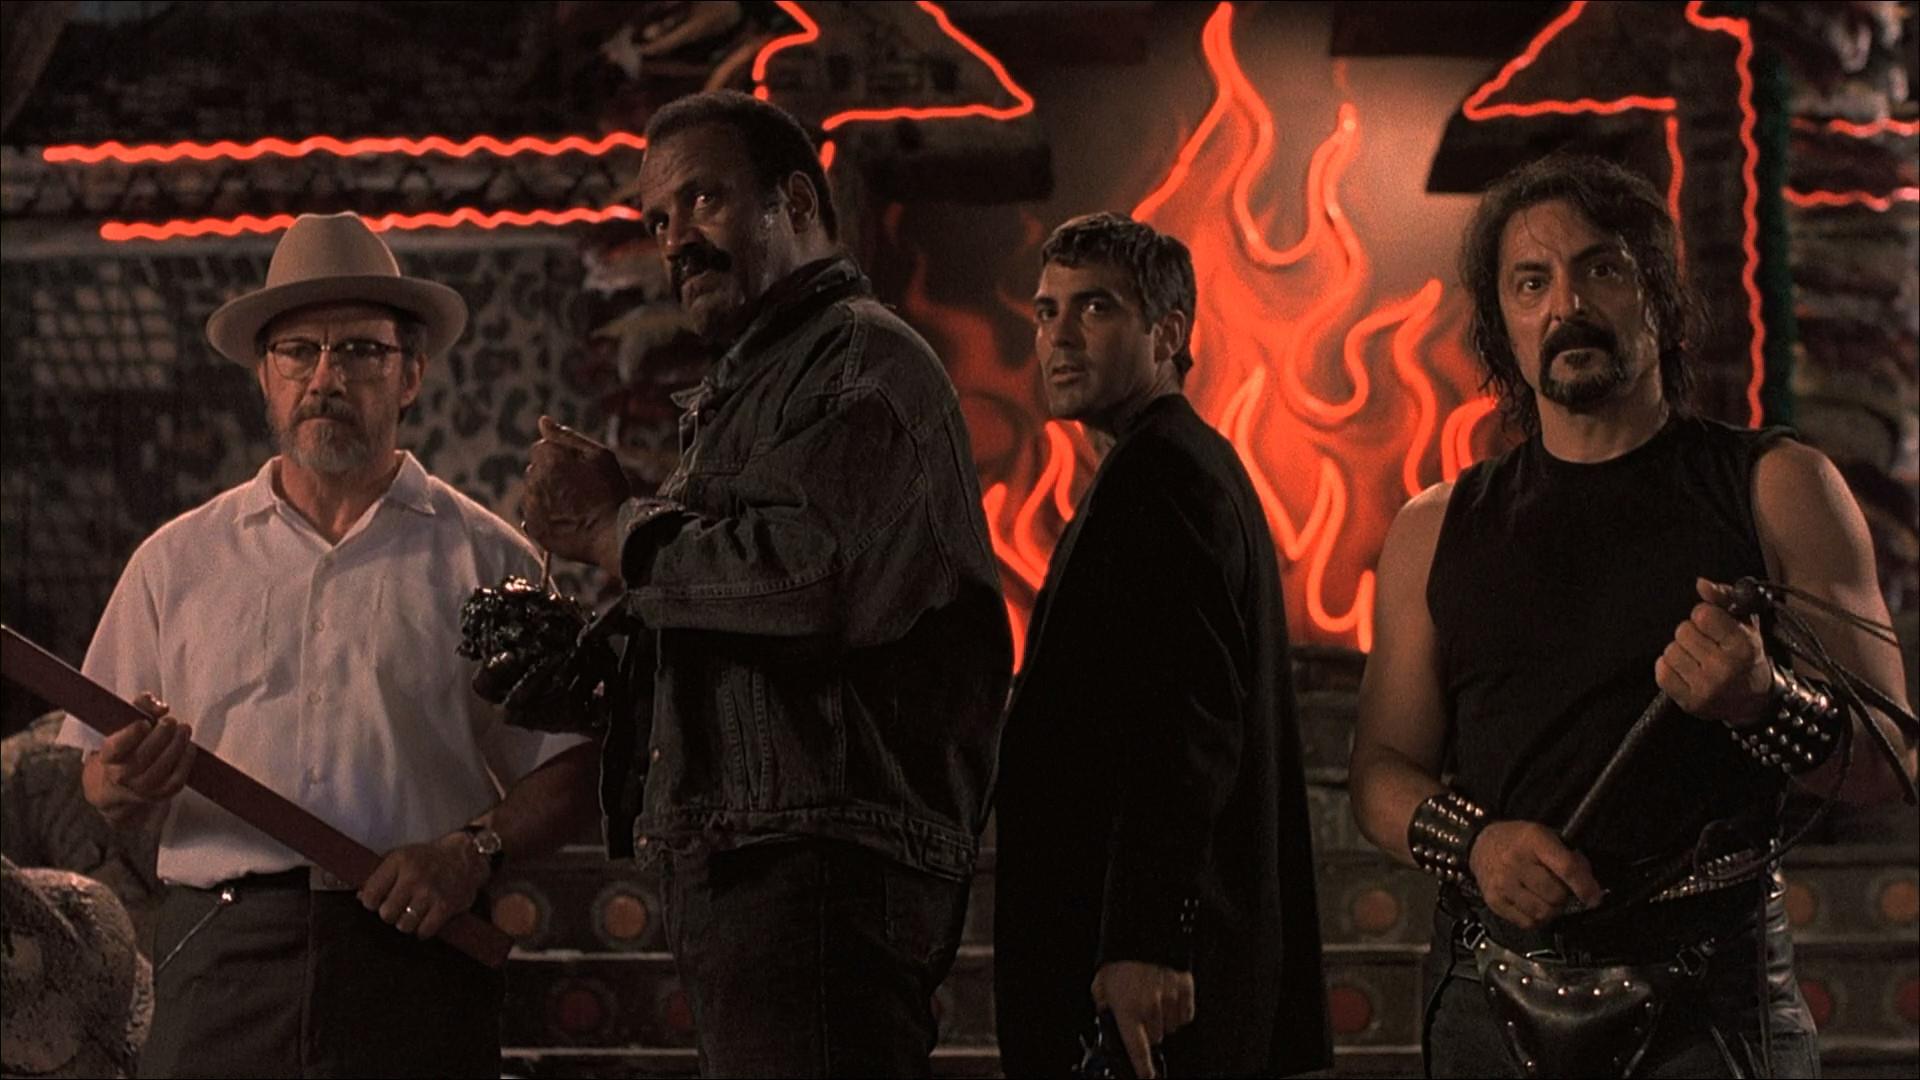 Harvey Keitel, Fred Williamson, George Clooney et Tom Savin dans Une nuit en enfer